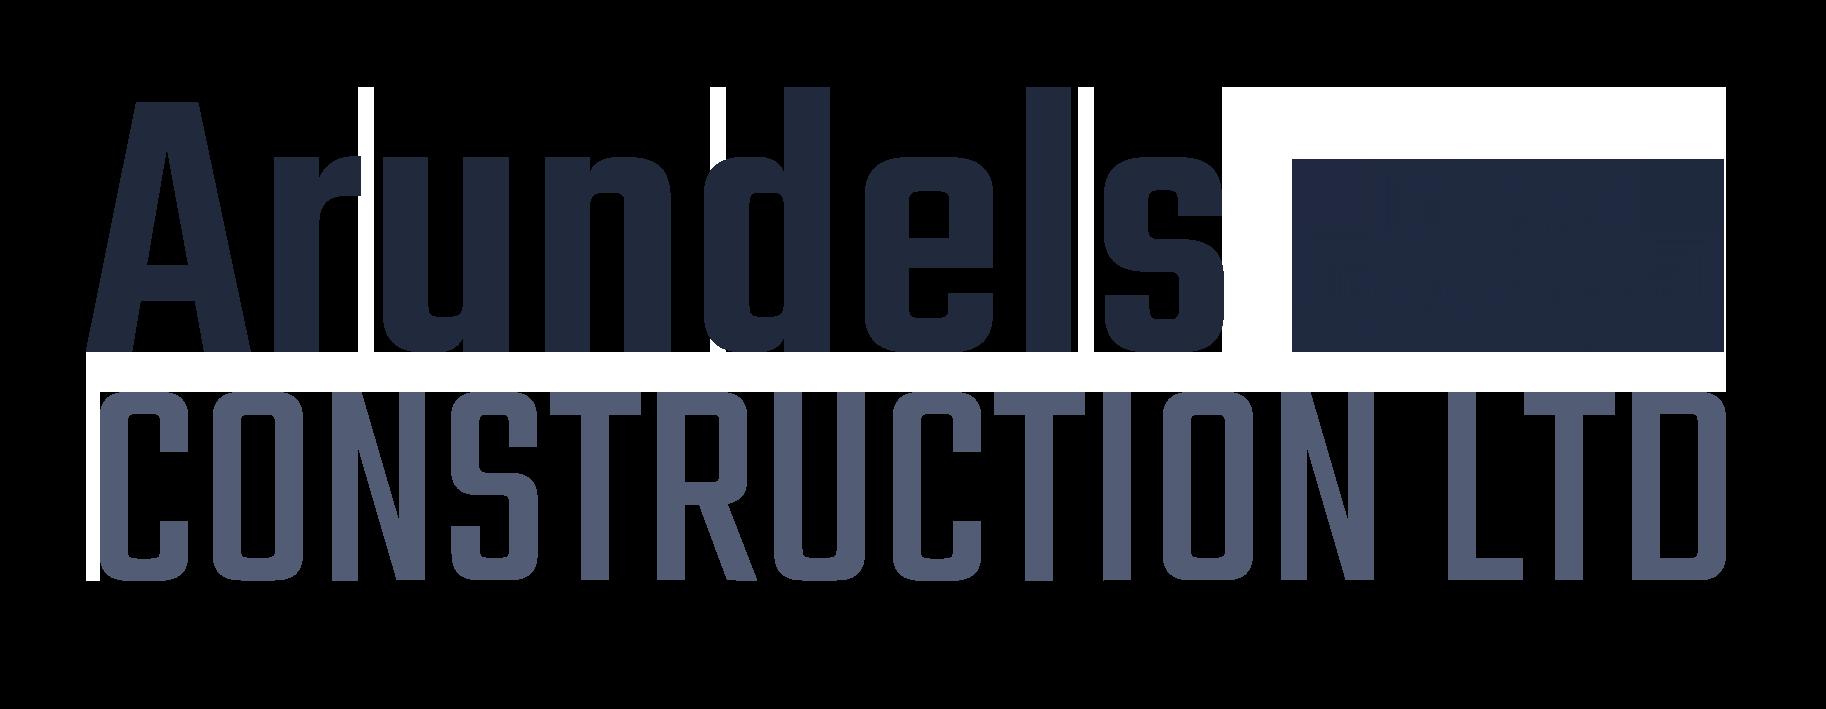 Arundel Construction Ltd